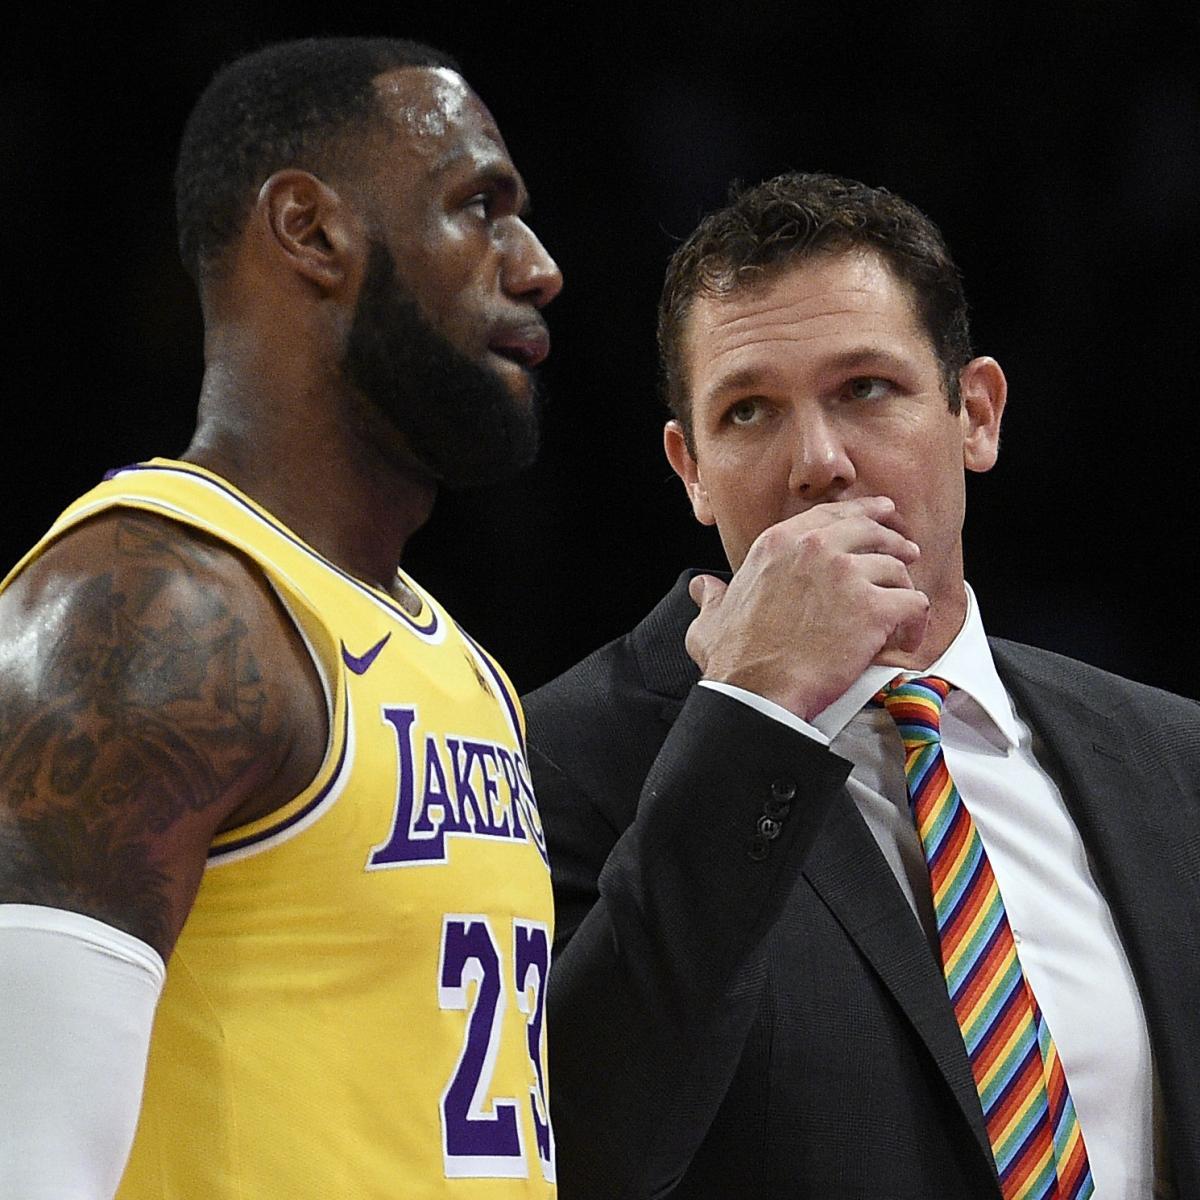 Lakers News: Luke Walton Says LeBron James' Minutes Will Be Monitored